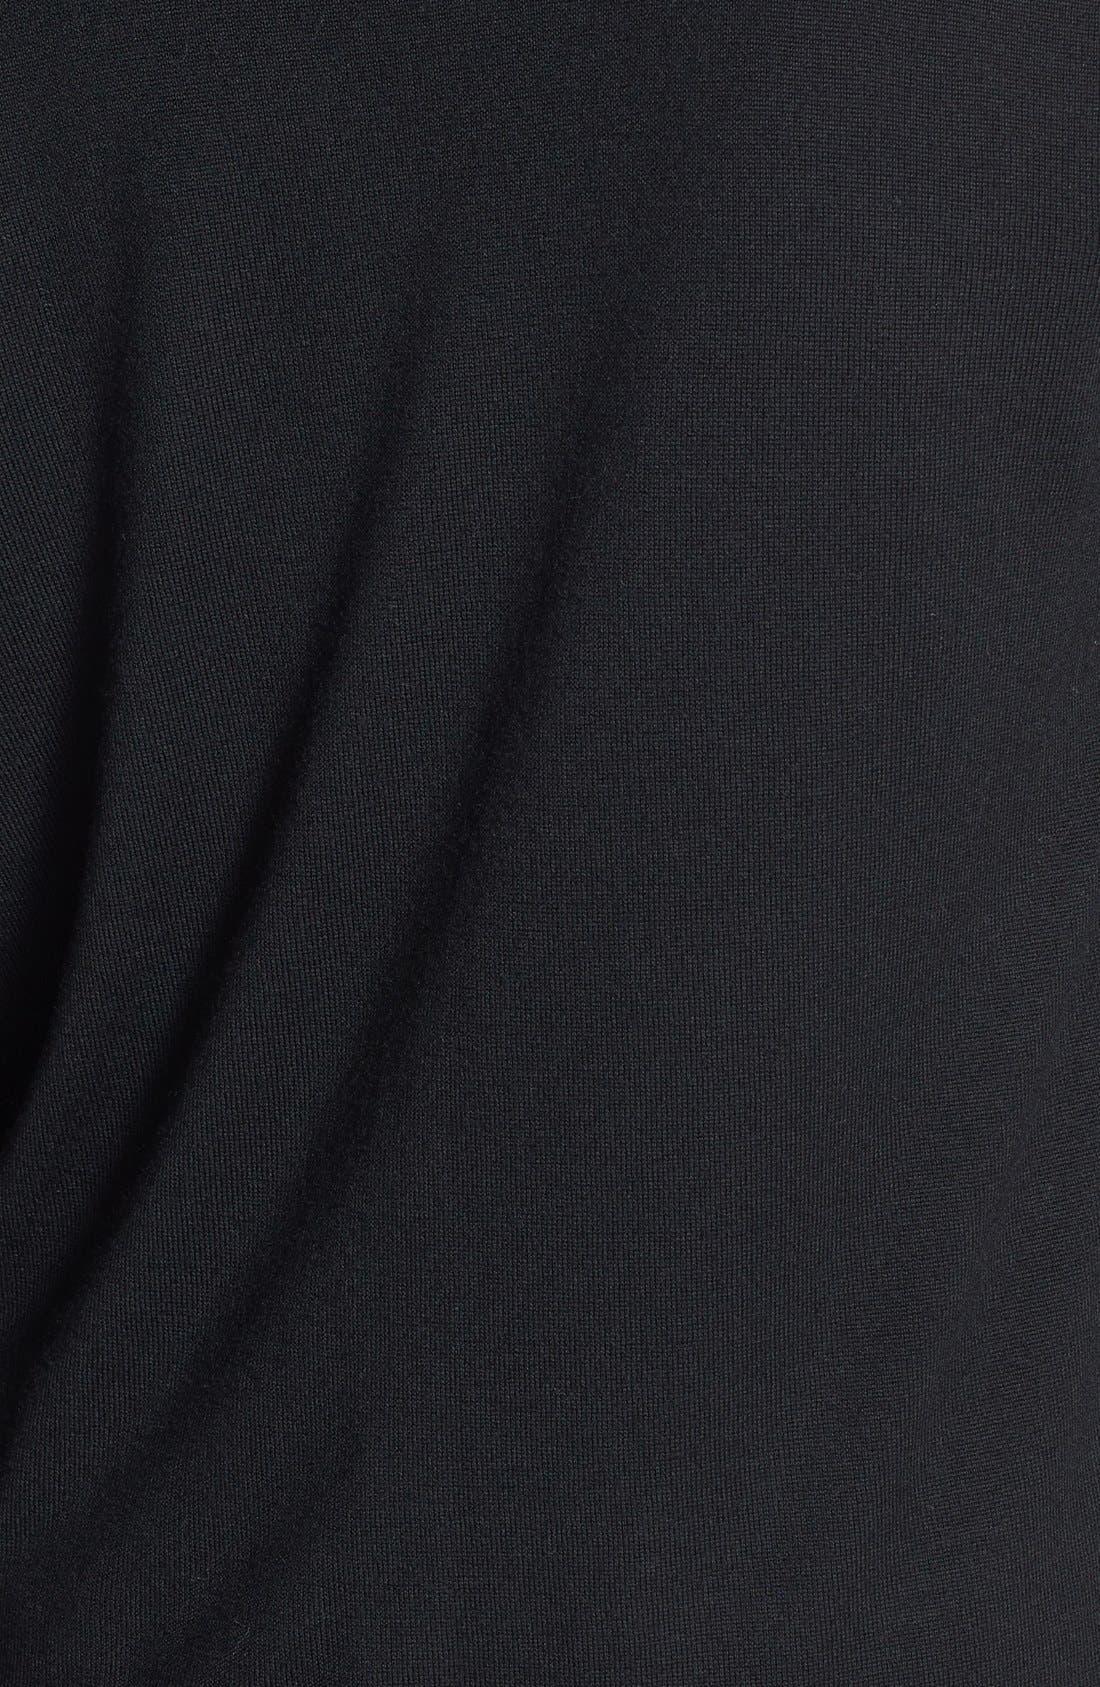 Zip Pocket V-Neck Cardigan,                             Alternate thumbnail 3, color,                             001